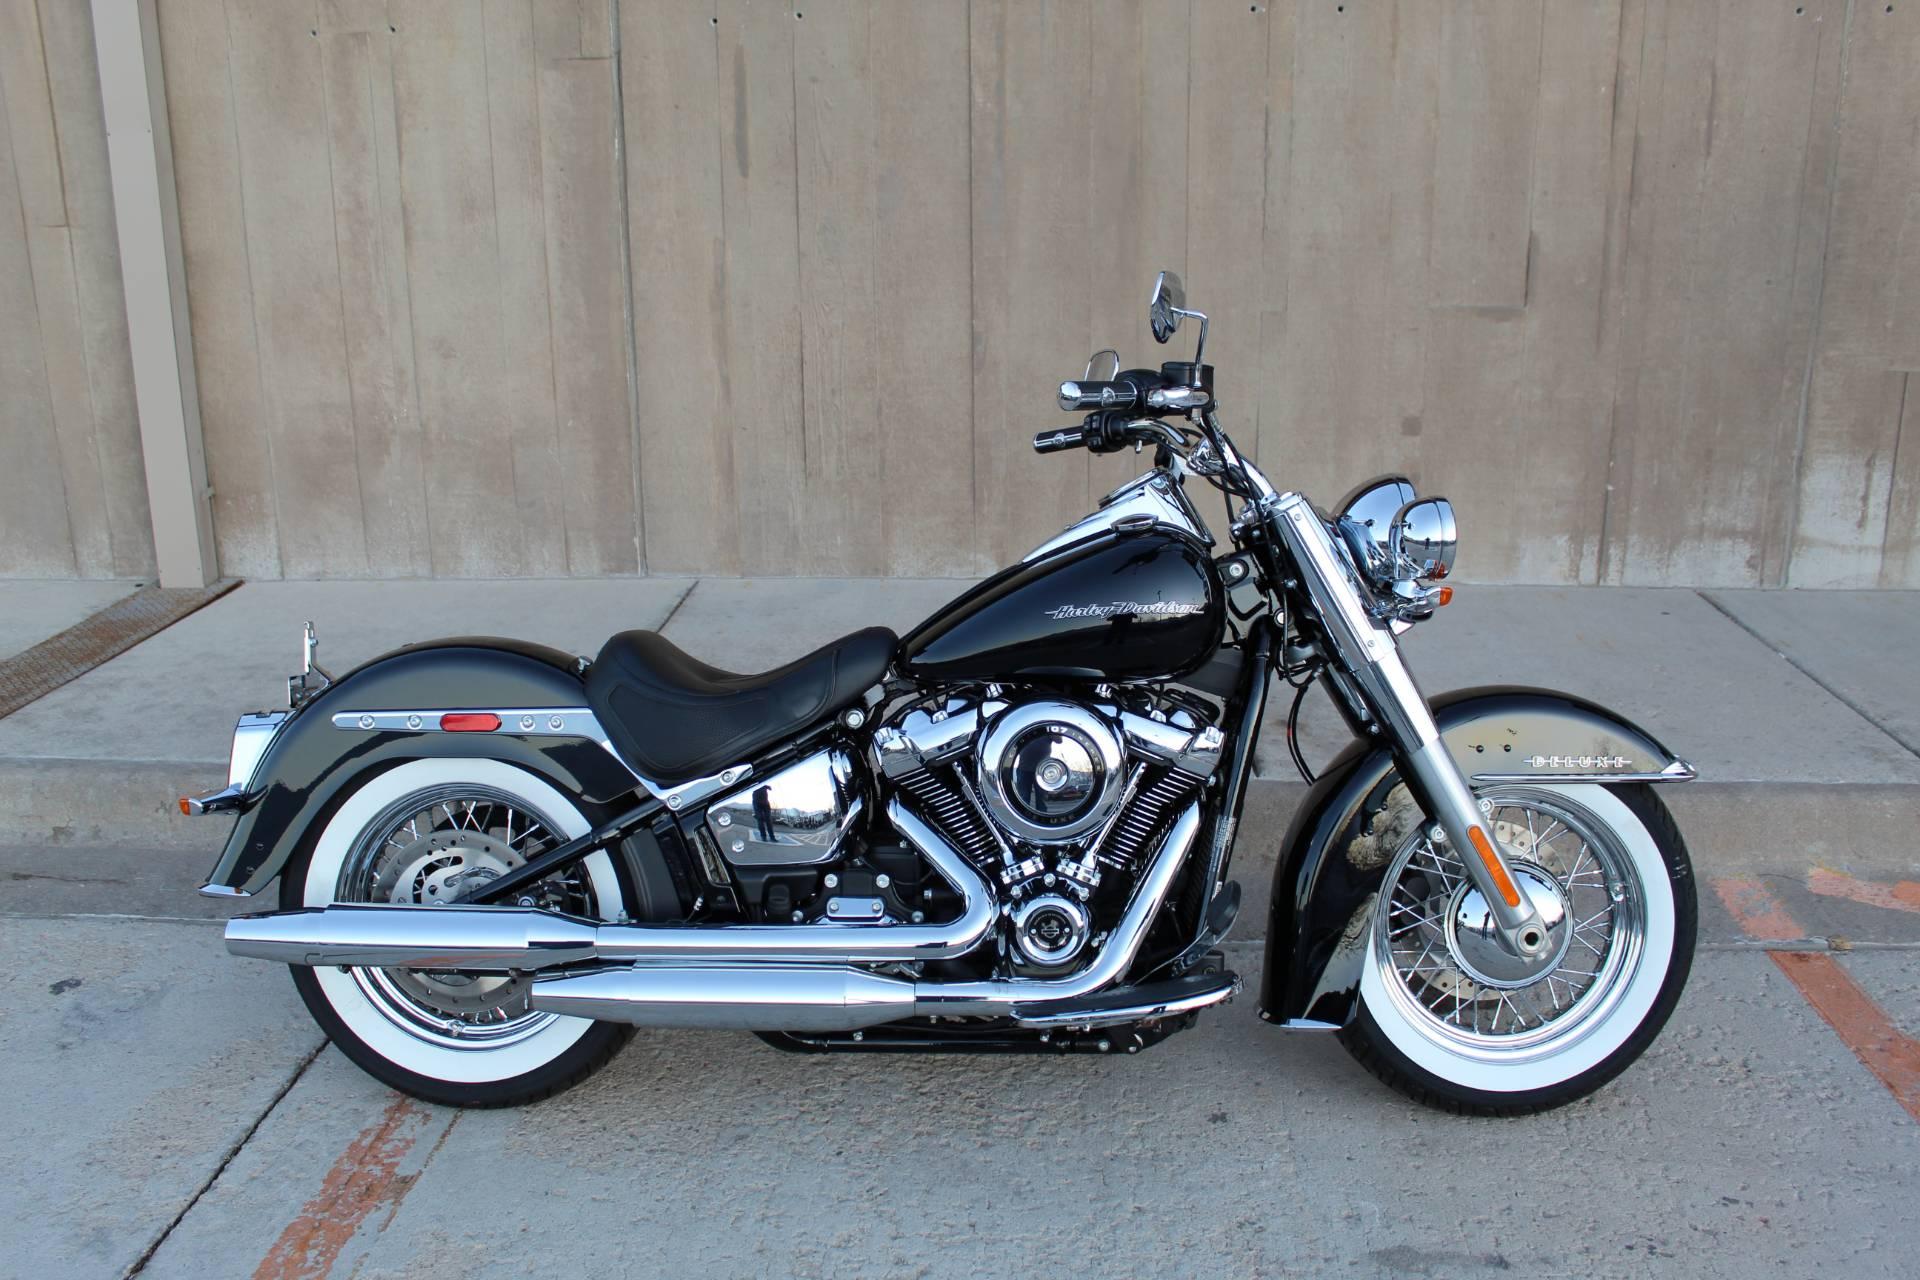 Used Tires Colorado Springs >> 2019 Harley Davidson Deluxe In Colorado Springs Colorado